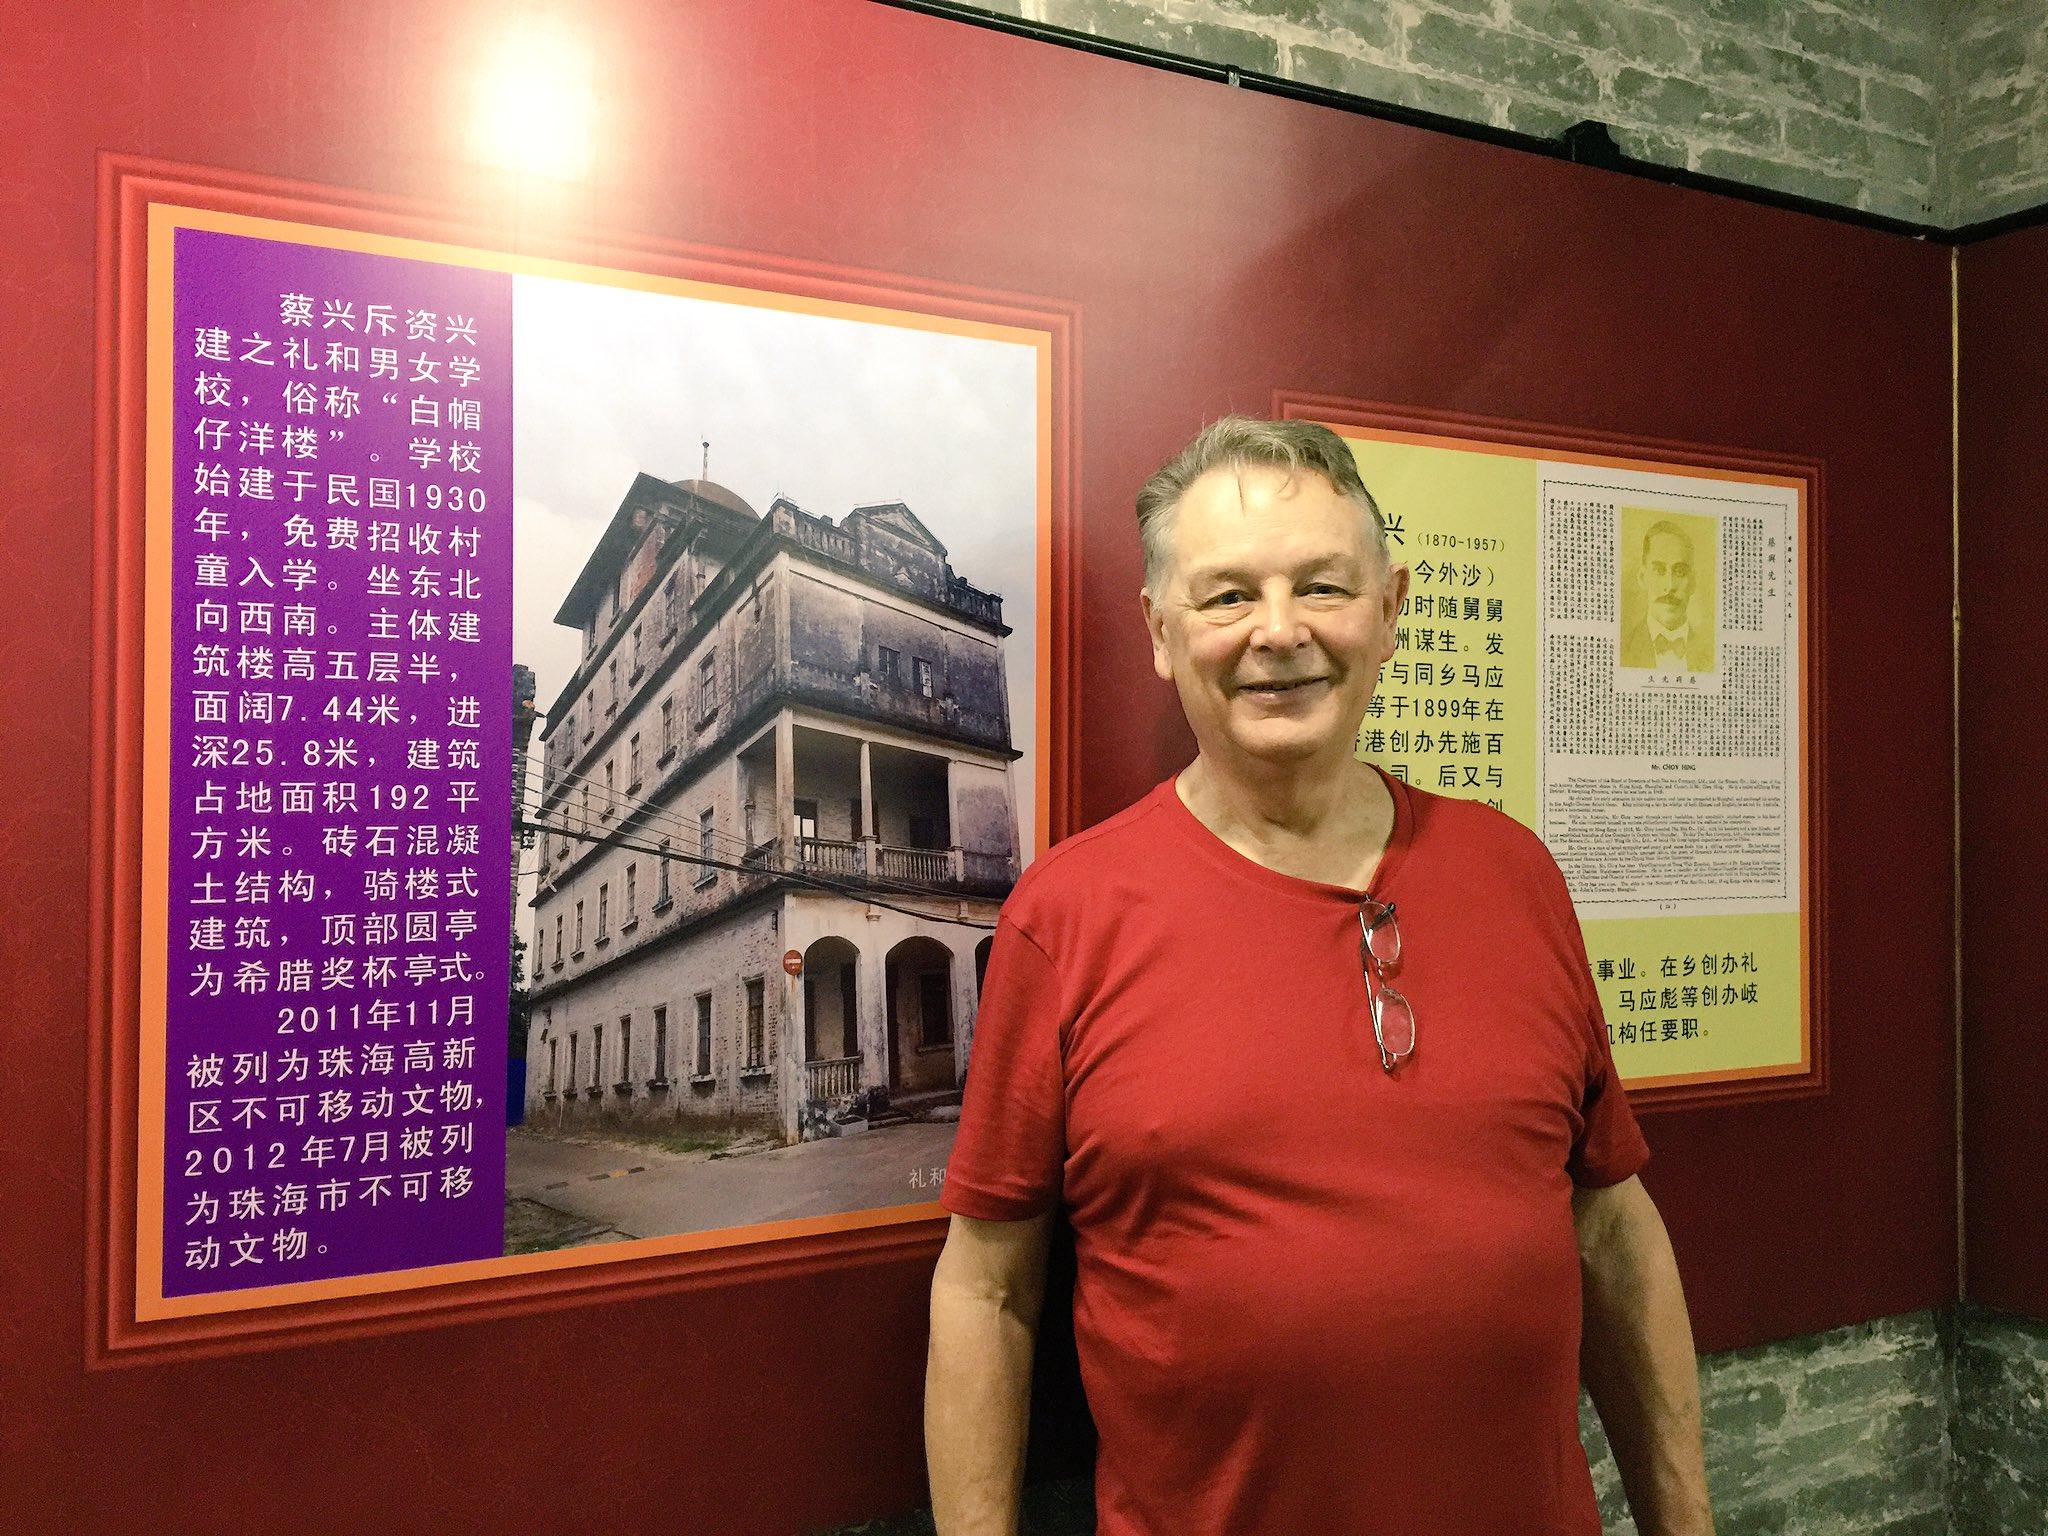 A beaming Howard visiting Choy Hing's ancestral village of Waisha in Zhuhai. #cahht17 https://t.co/tI2yt6R6zb